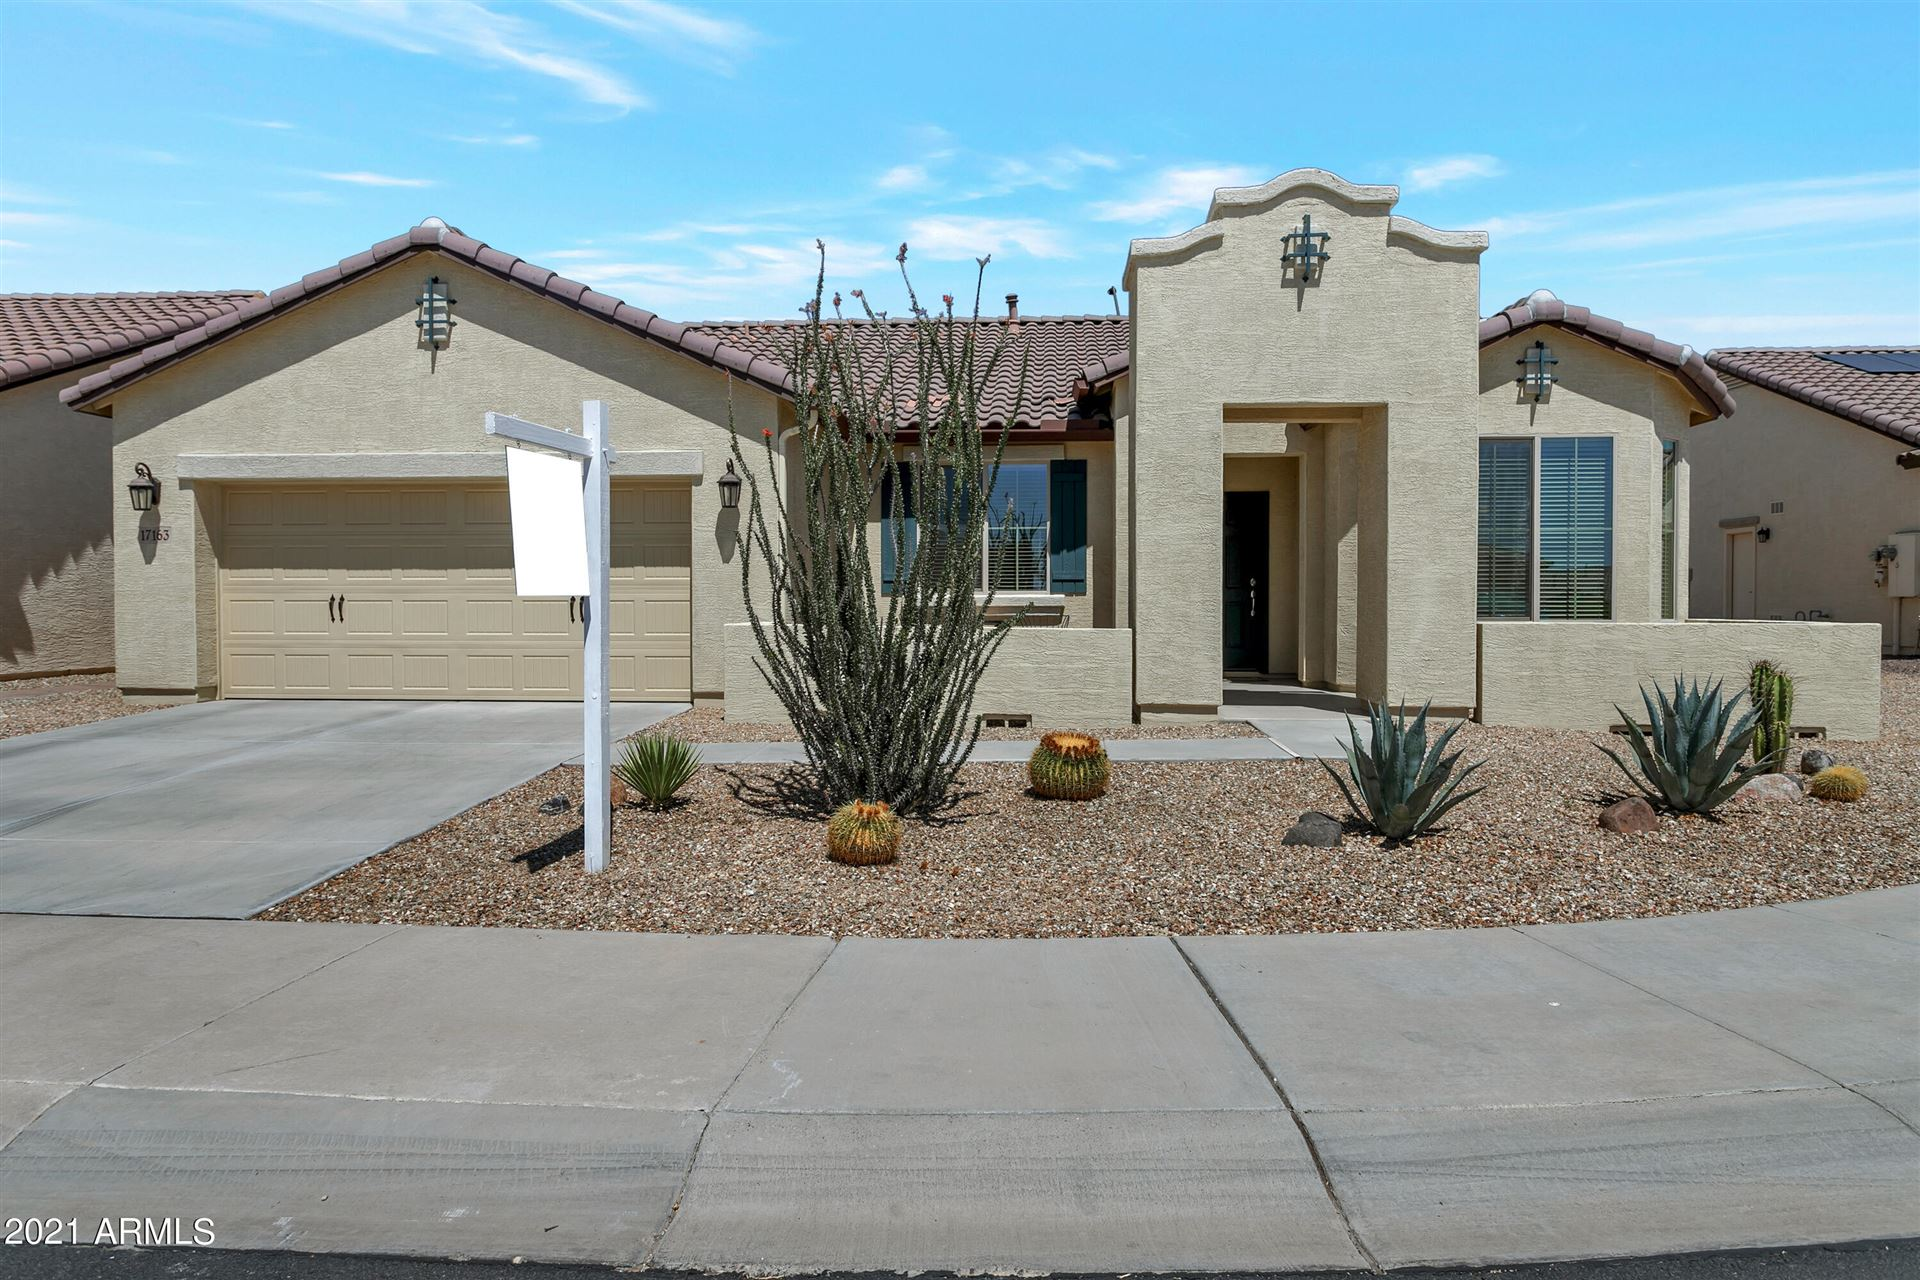 Photo of 17163 S 174TH Drive, Goodyear, AZ 85338 (MLS # 6231562)